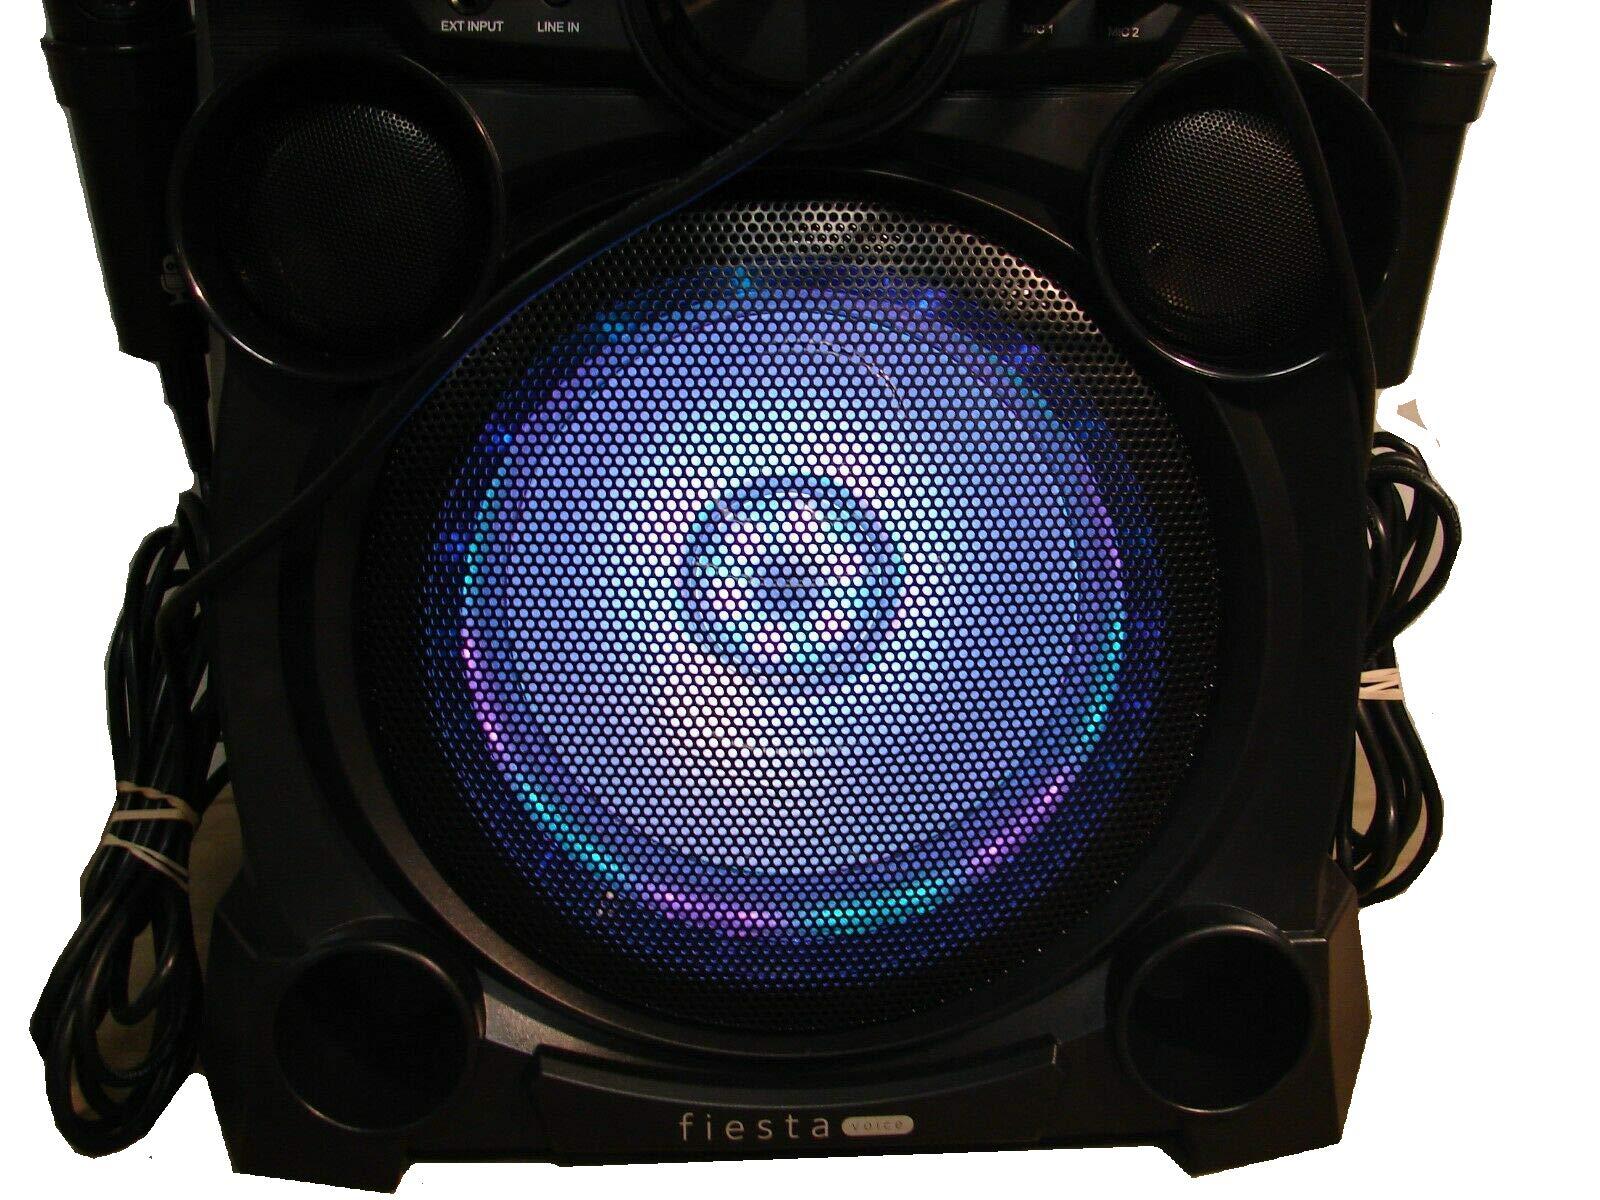 Amoldar 5inging Machine Fiest@ Voice Hi-Definition Karaoke System SDL9040 by Amoldar (Image #4)